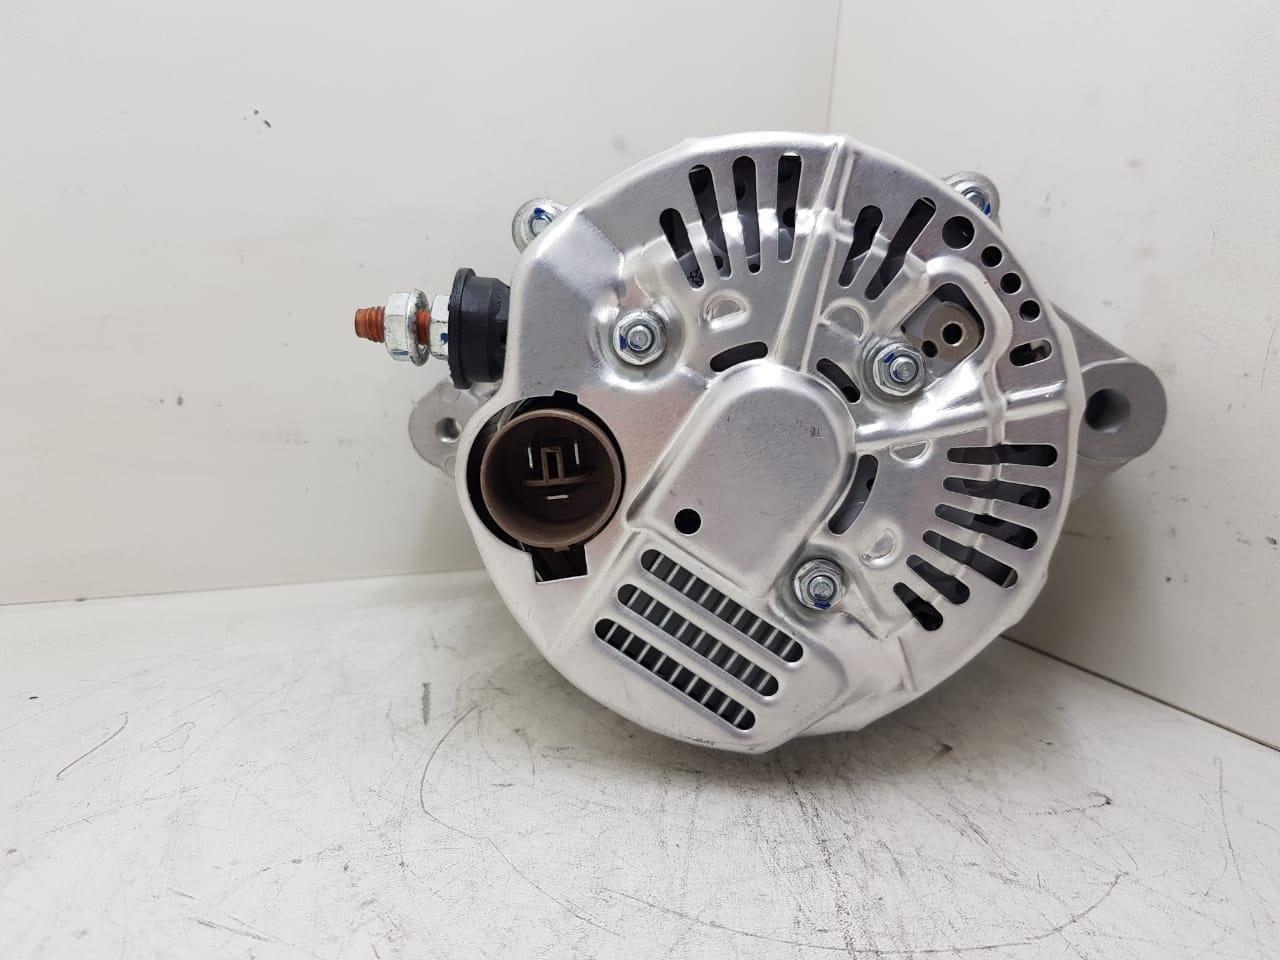 Alternador JHON DEERE Motor 6 466 DIESEL CUMMINS (POLIA DUPLA) DENSO 14V 120A RE36246 RE37201 10459495 1002116030 1002116031 100216050 1002116051 9020405 1002116050 E 70630 D 10402 SL A0251 AEC27025